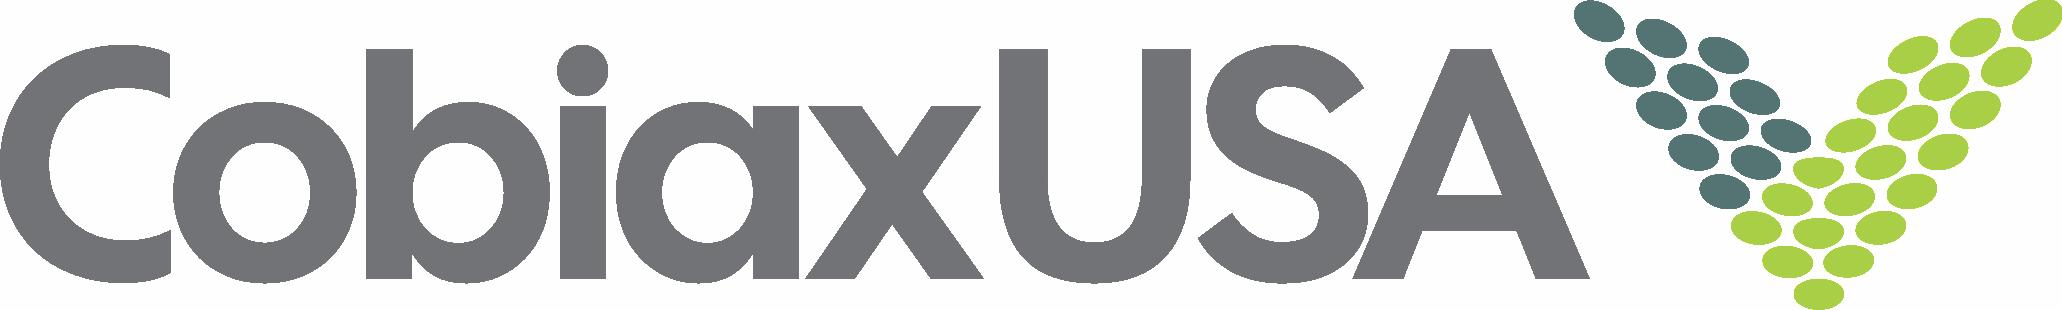 CobiaxUSA Logo MD-HZ-CL.png